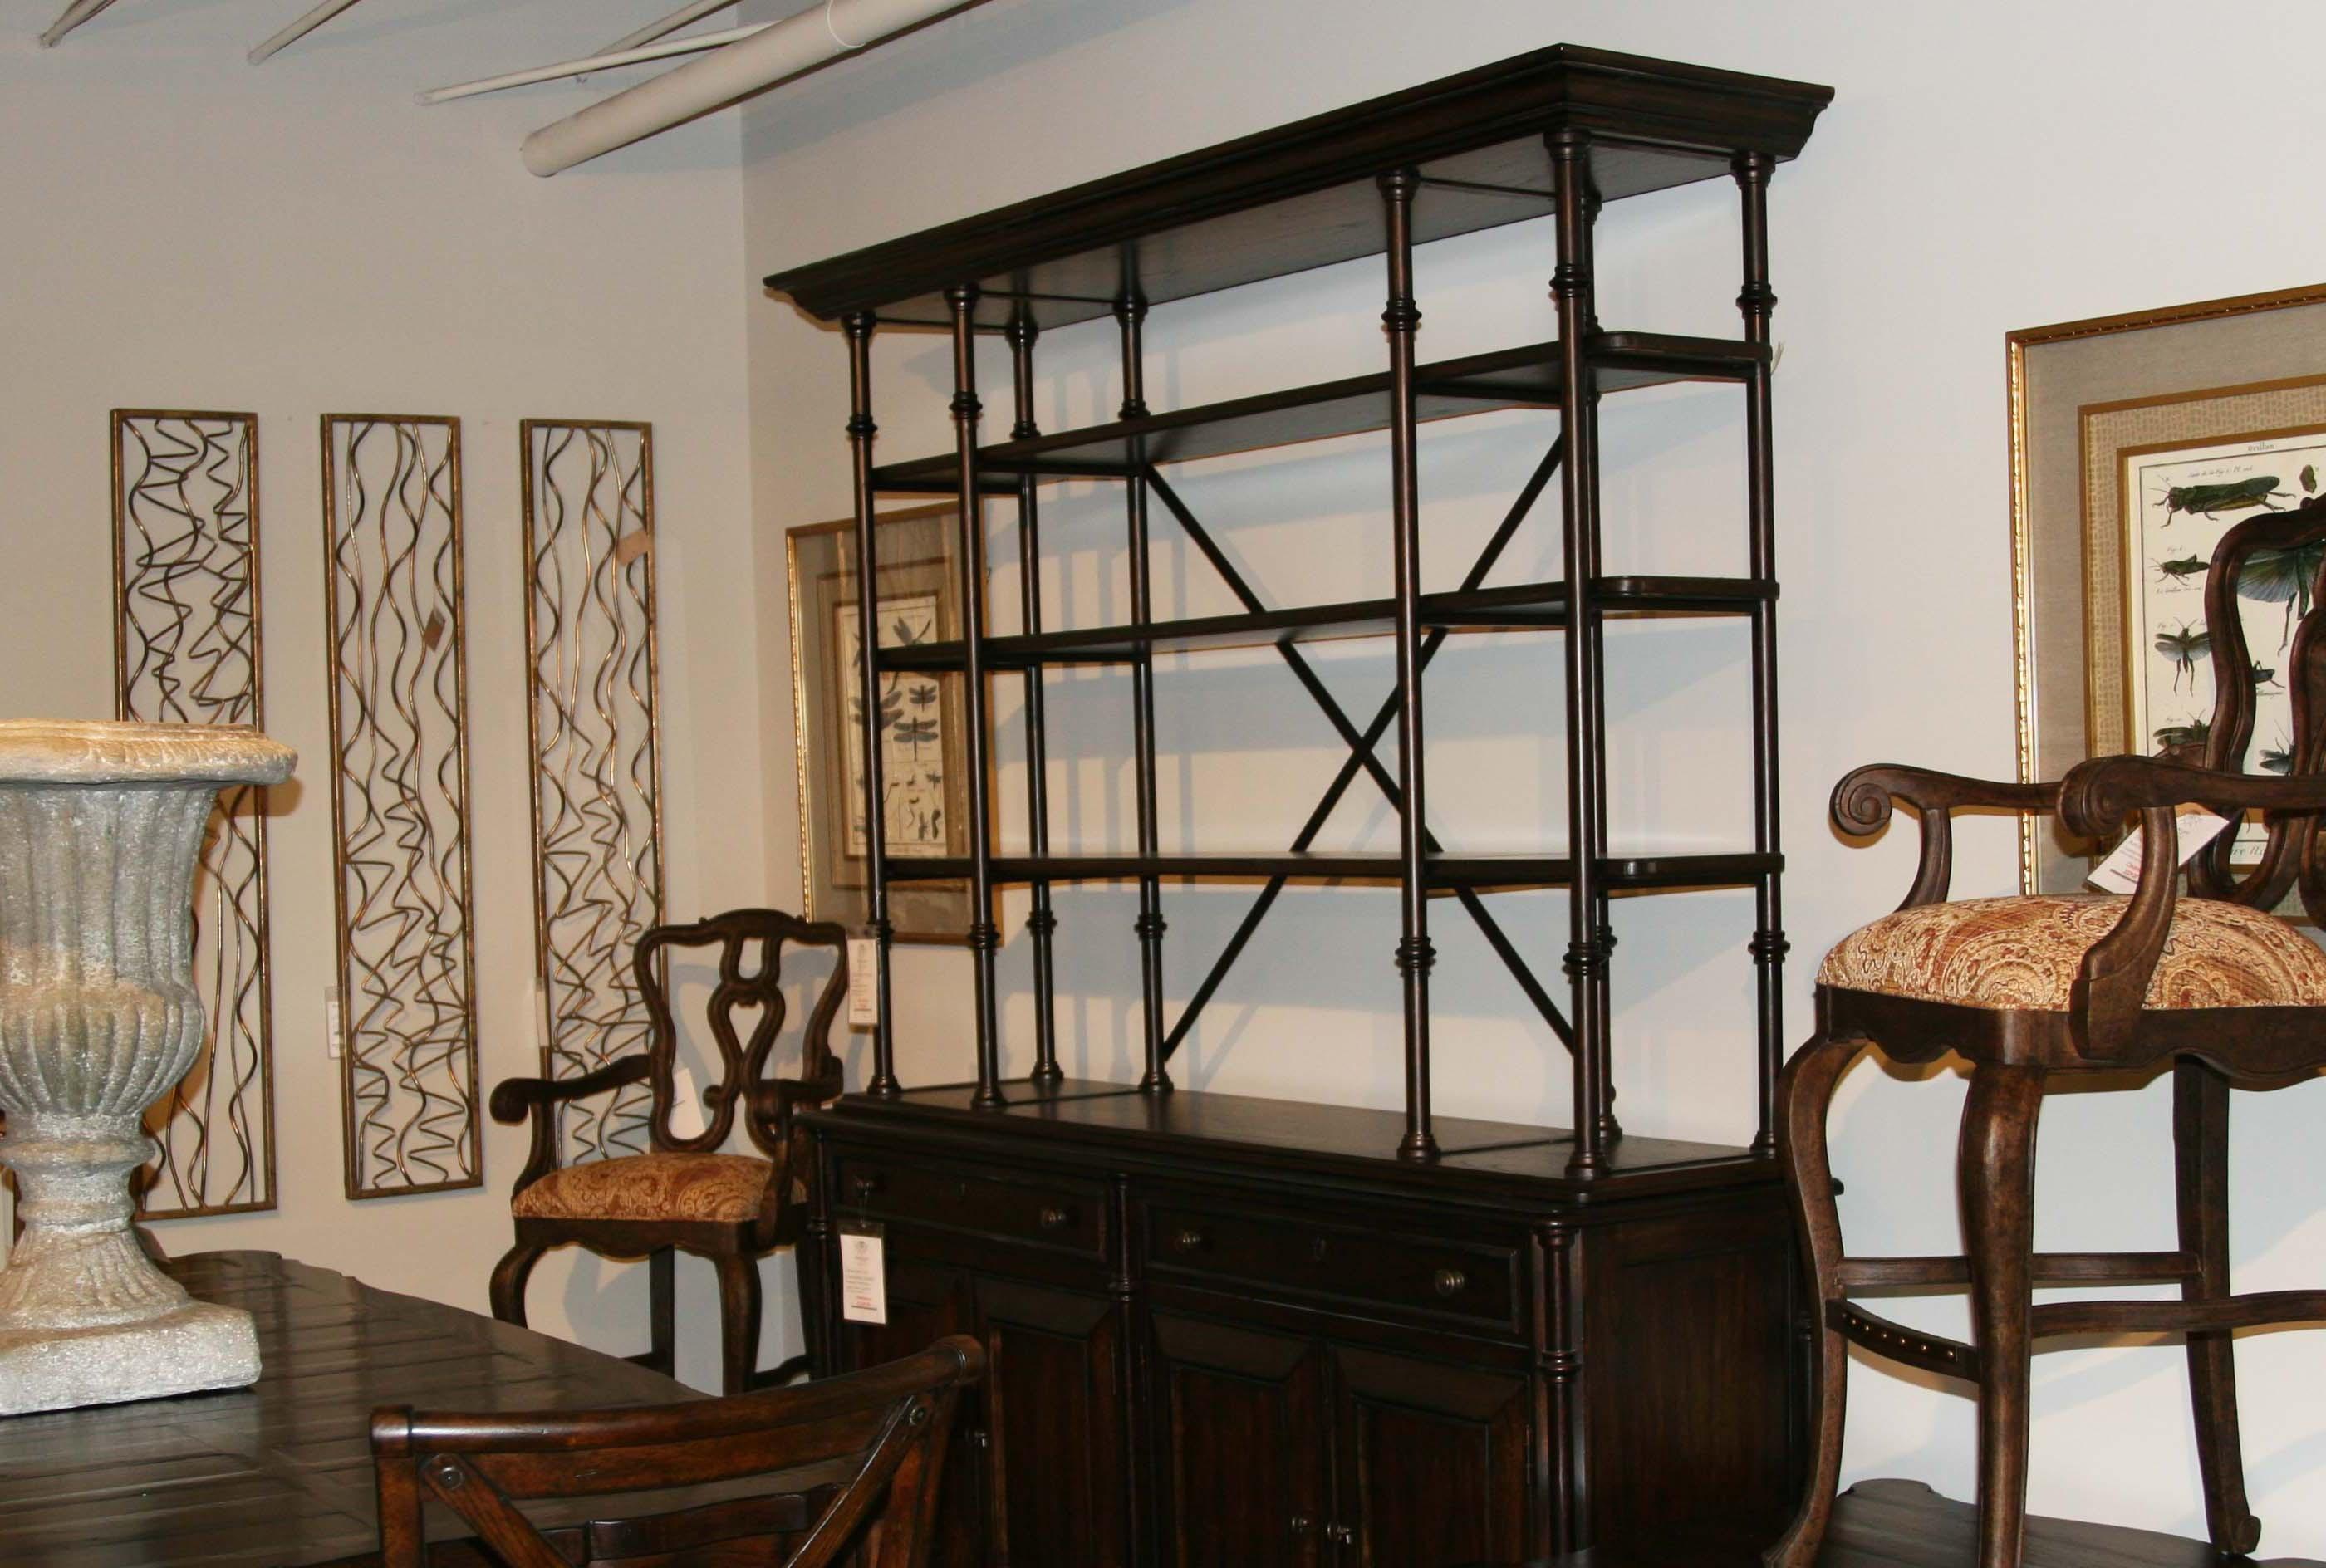 Stanley Furniture Outlet By Goodu0027s European Farmhouse   Lu0027Acrobat Open Air  Shelf By Stanley